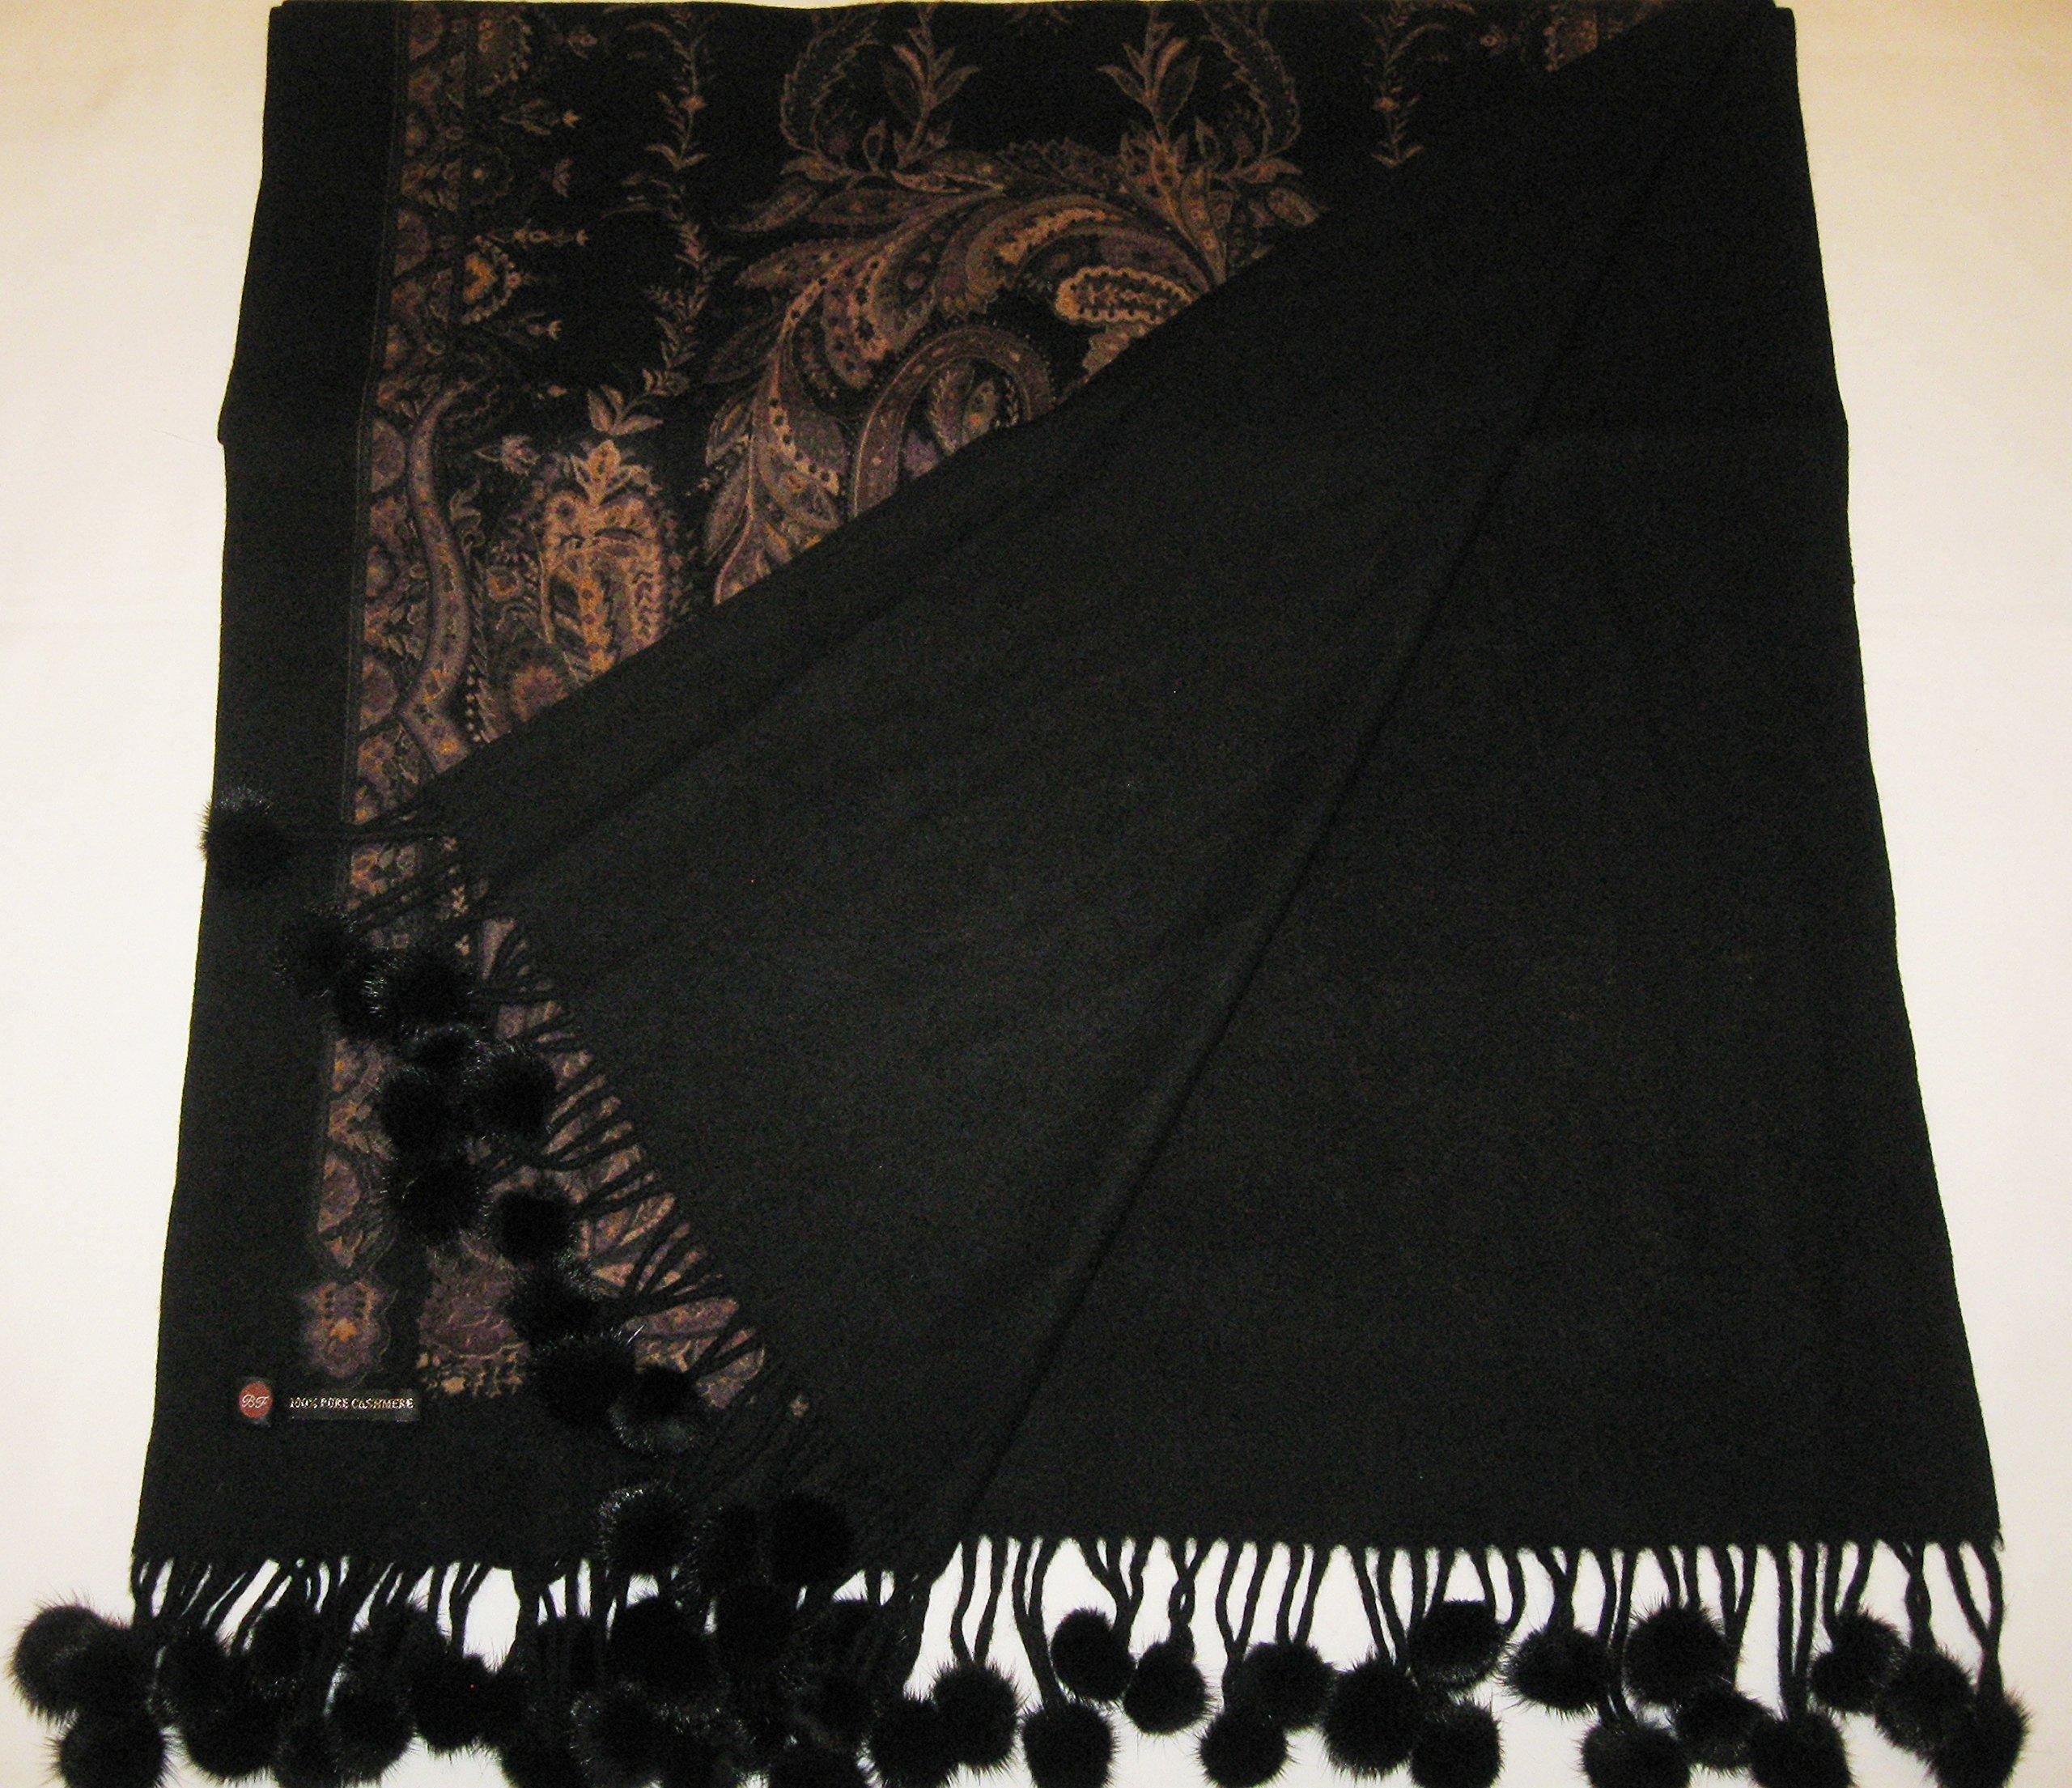 Cashmere Pashmina Group-Cashmere Shawl Scarf Wrap Stole (Solid/ Reversible Print w/ Genuine Fur) - Mink Black by Cashmere Pashmina Group (Image #8)